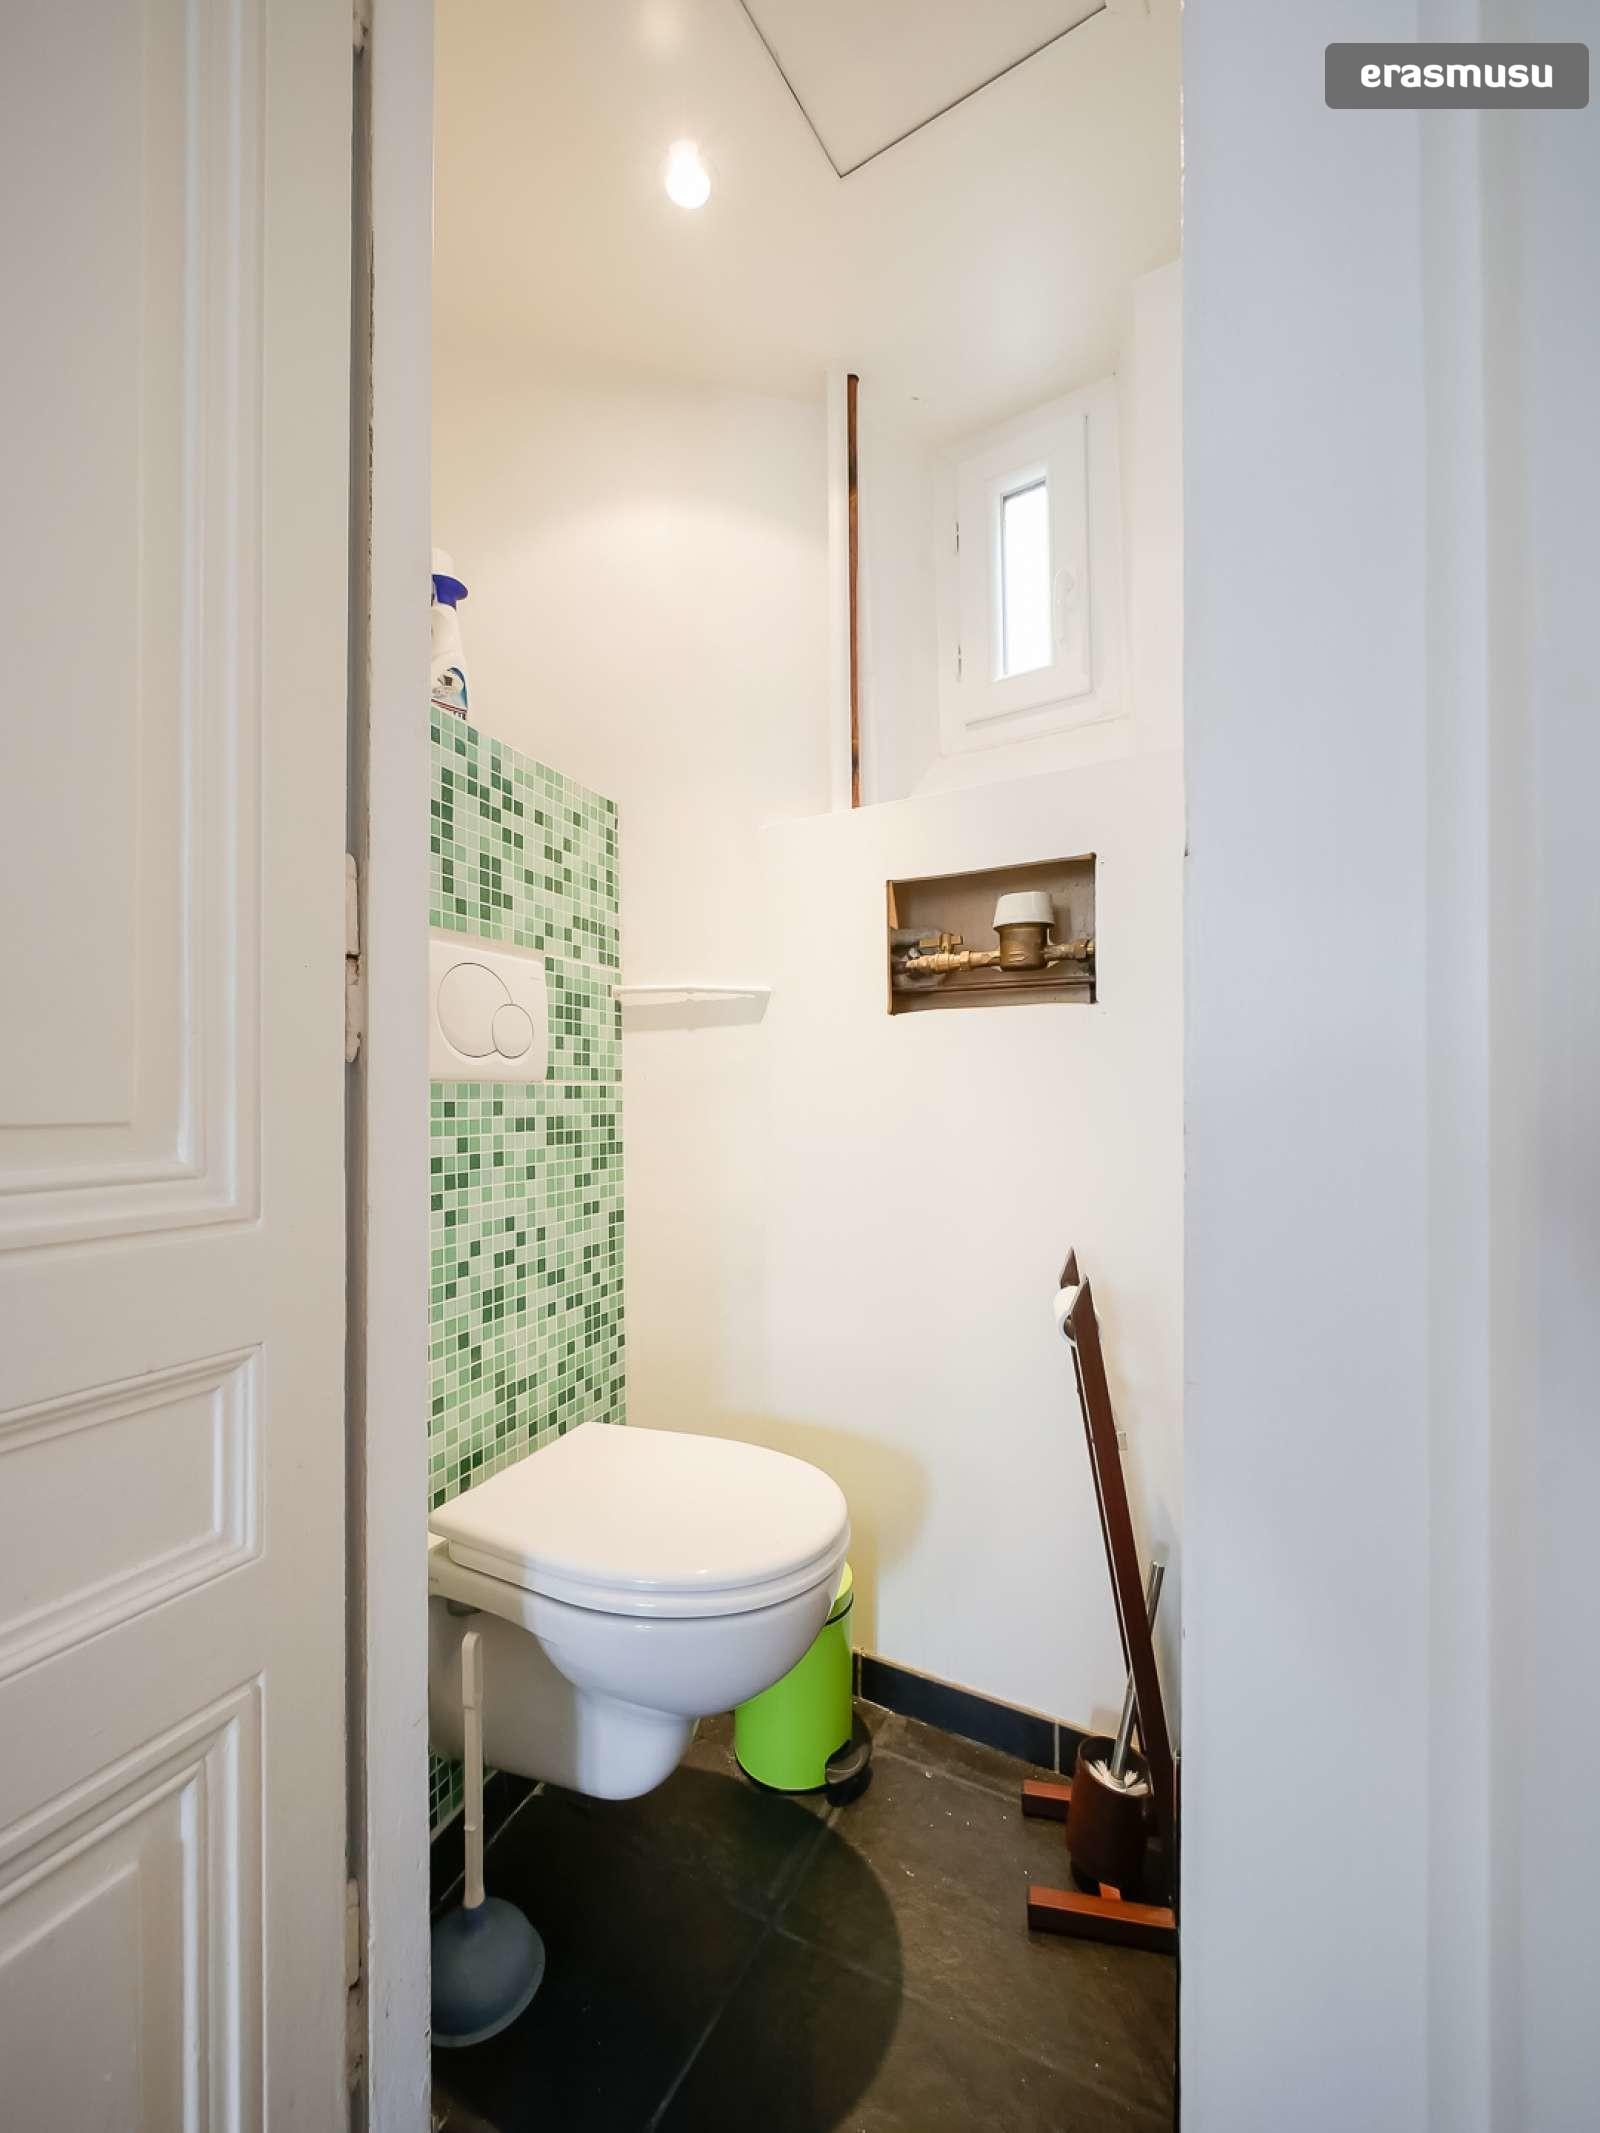 spacious-2-bedroom-apartment-rent-cordeliers-4f3b8c5194ac99361da